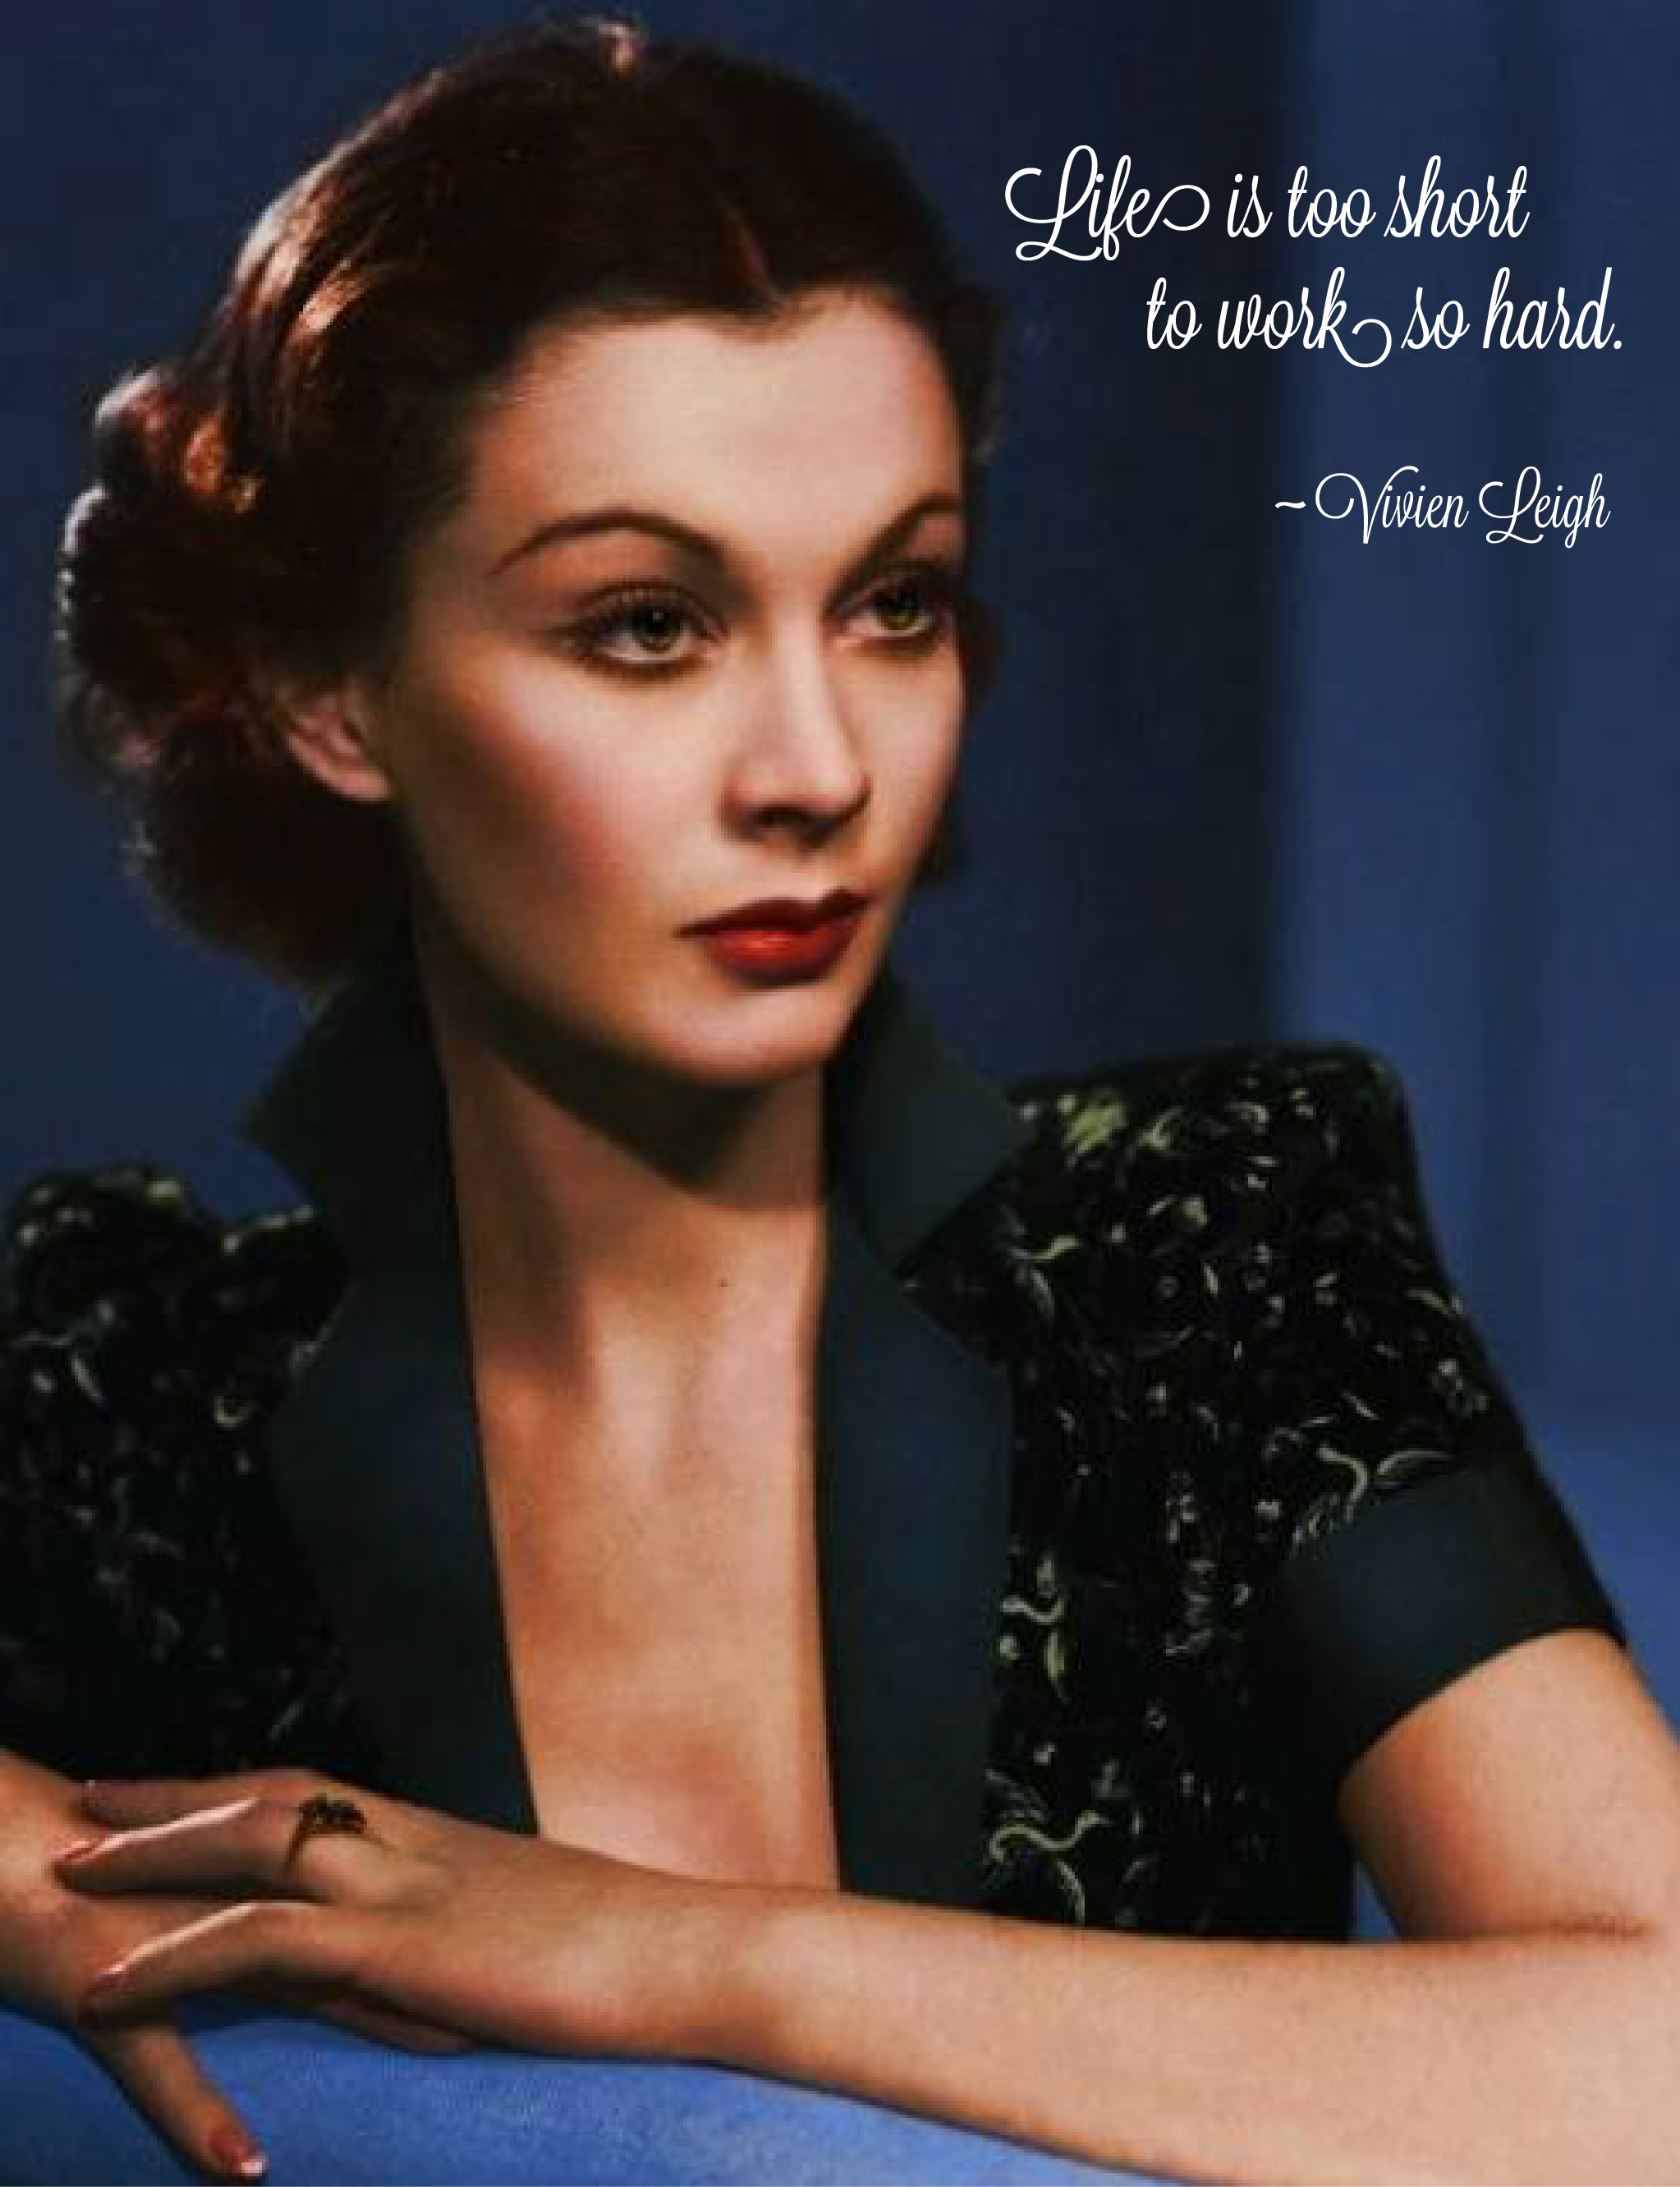 Vivien Leigh's quote #4